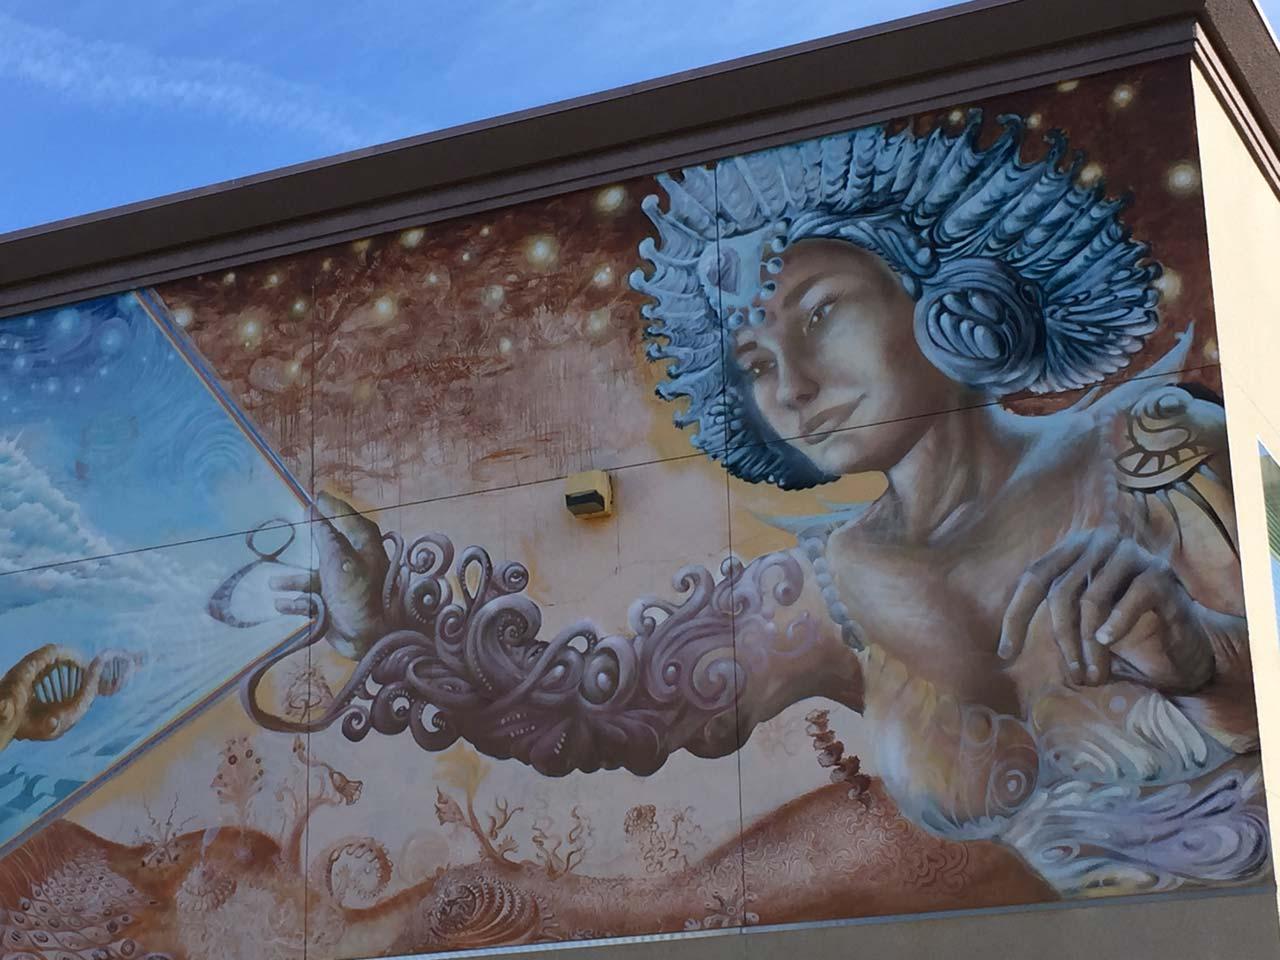 "<div class=""meta image-caption""><div class=""origin-logo origin-image kfsn""><span>KFSN</span></div><span class=""caption-text"">Sunnyside High School photography students tour the Mural District in Downtown Fresno (Amanda Venegas)</span></div>"